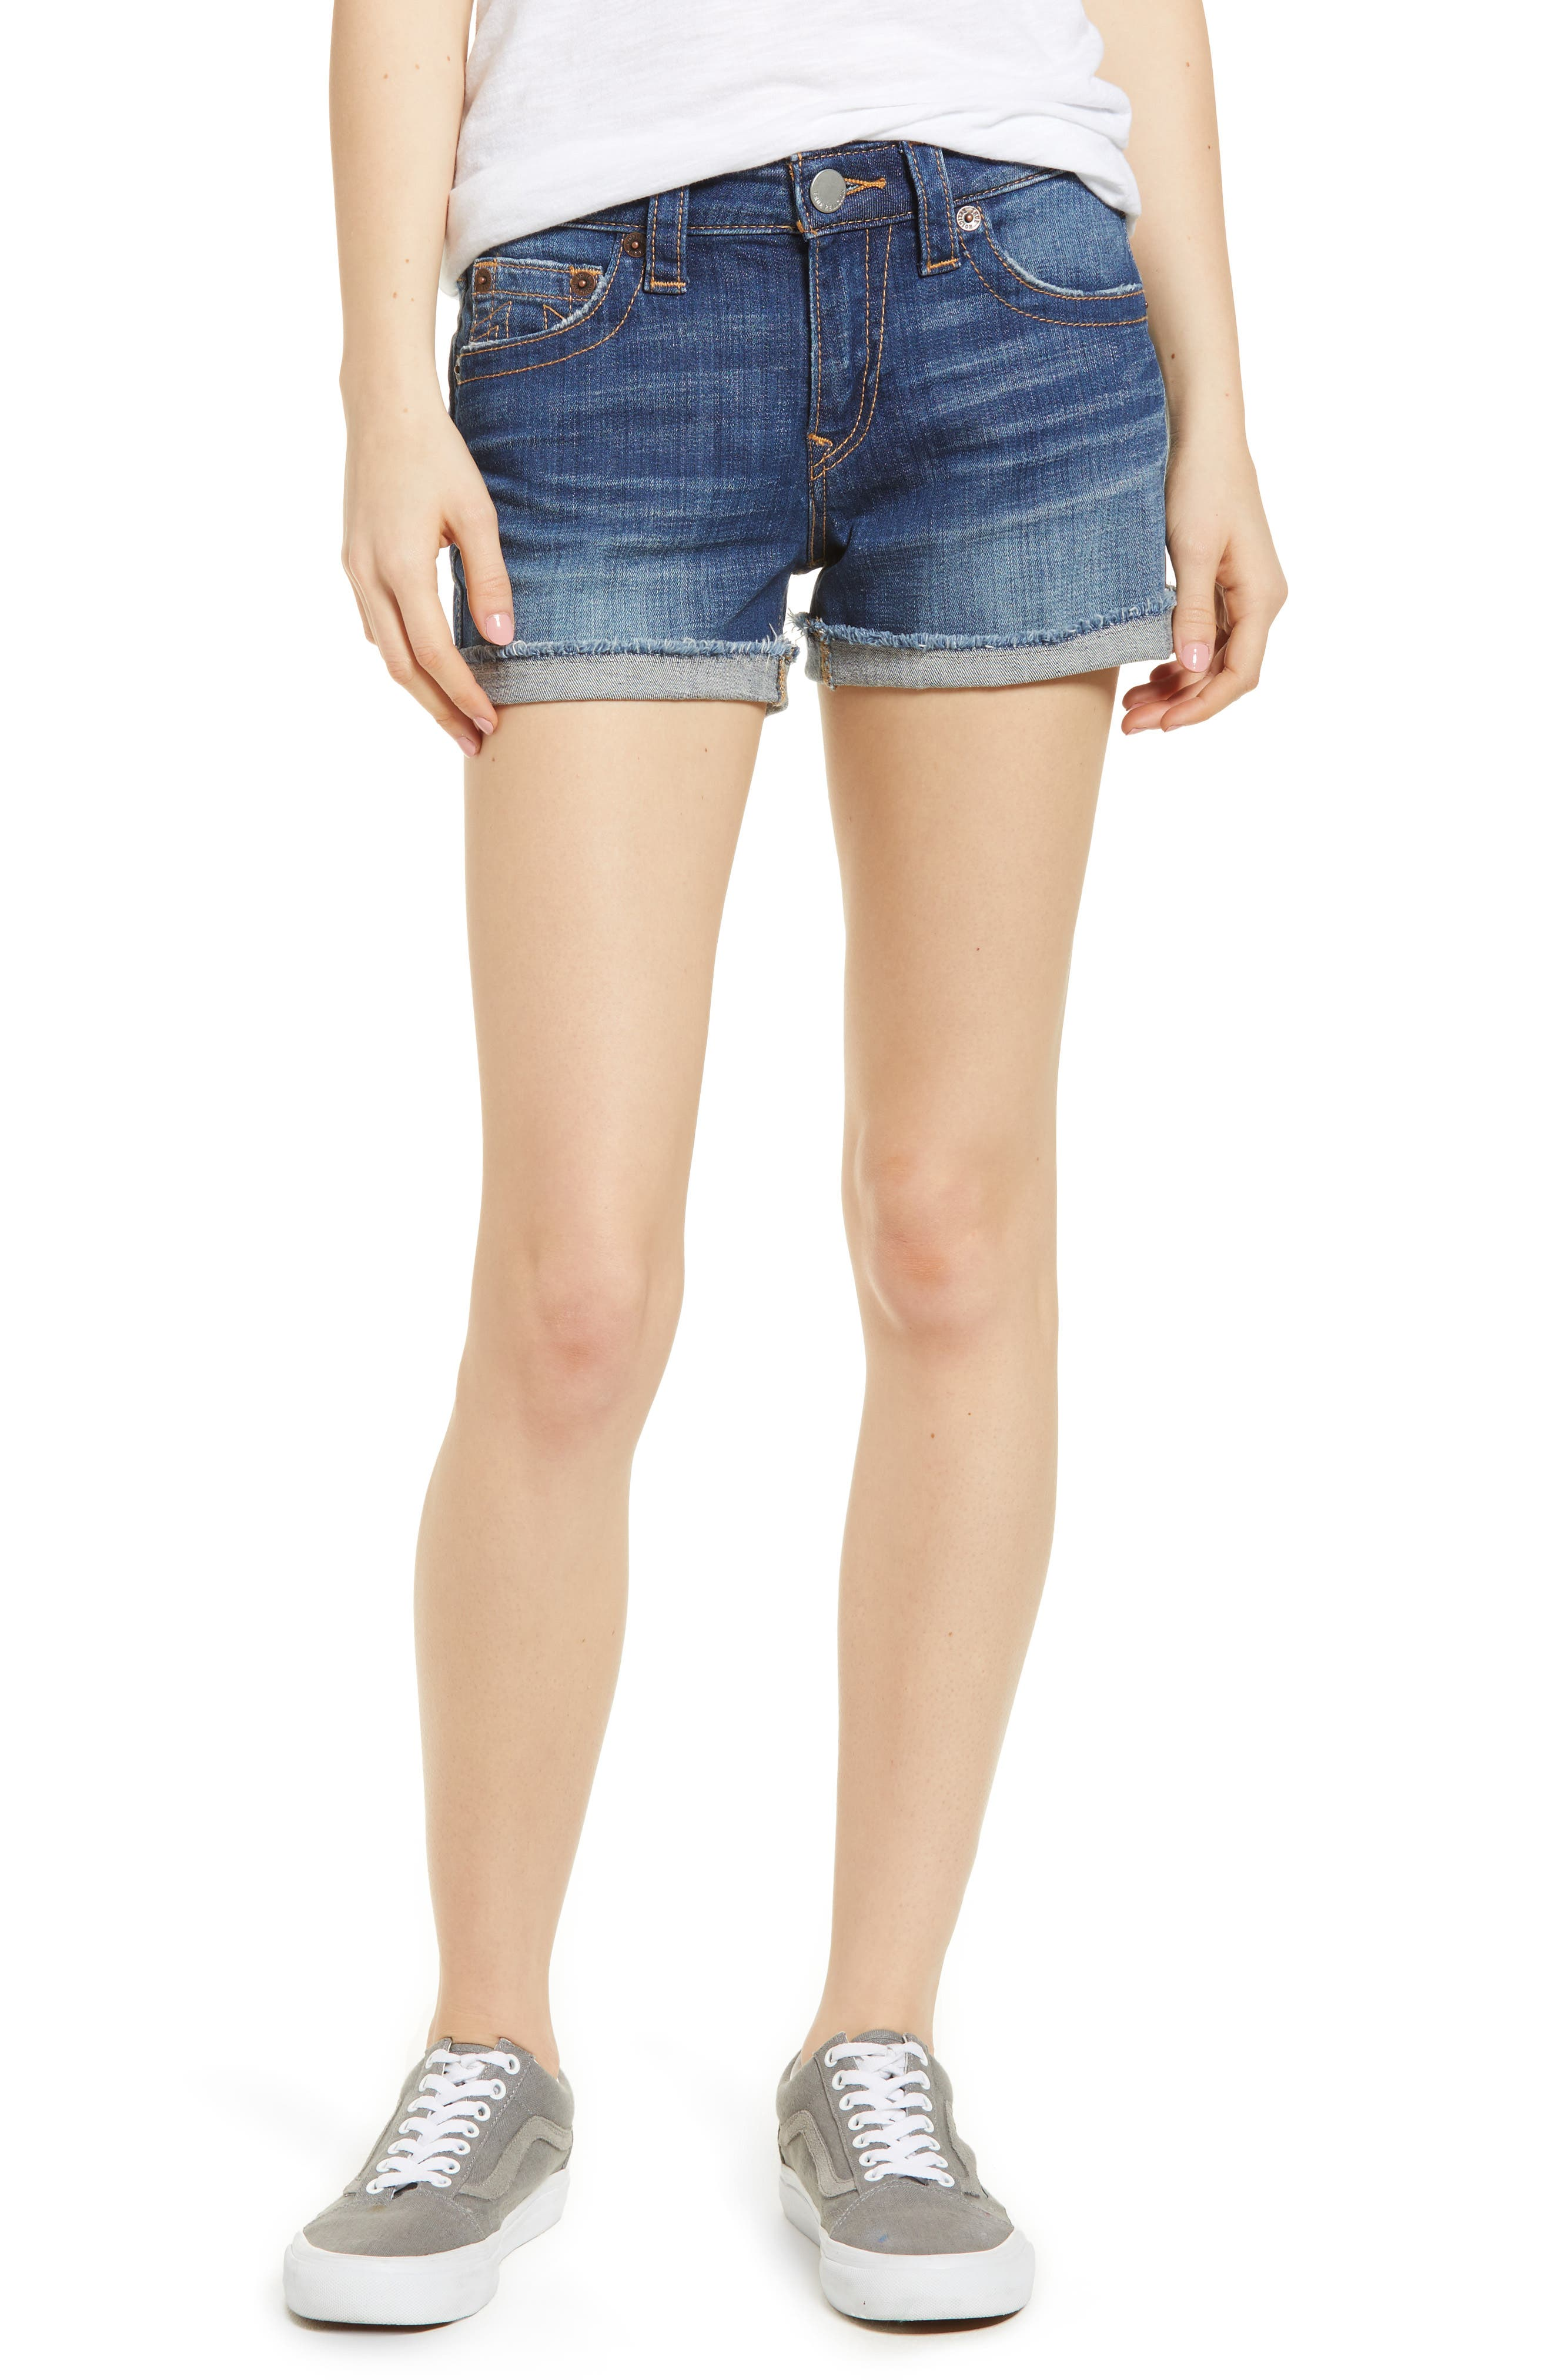 True Religion Brand Jeans Jennie Curvy Denim Shorts (Gen Z)